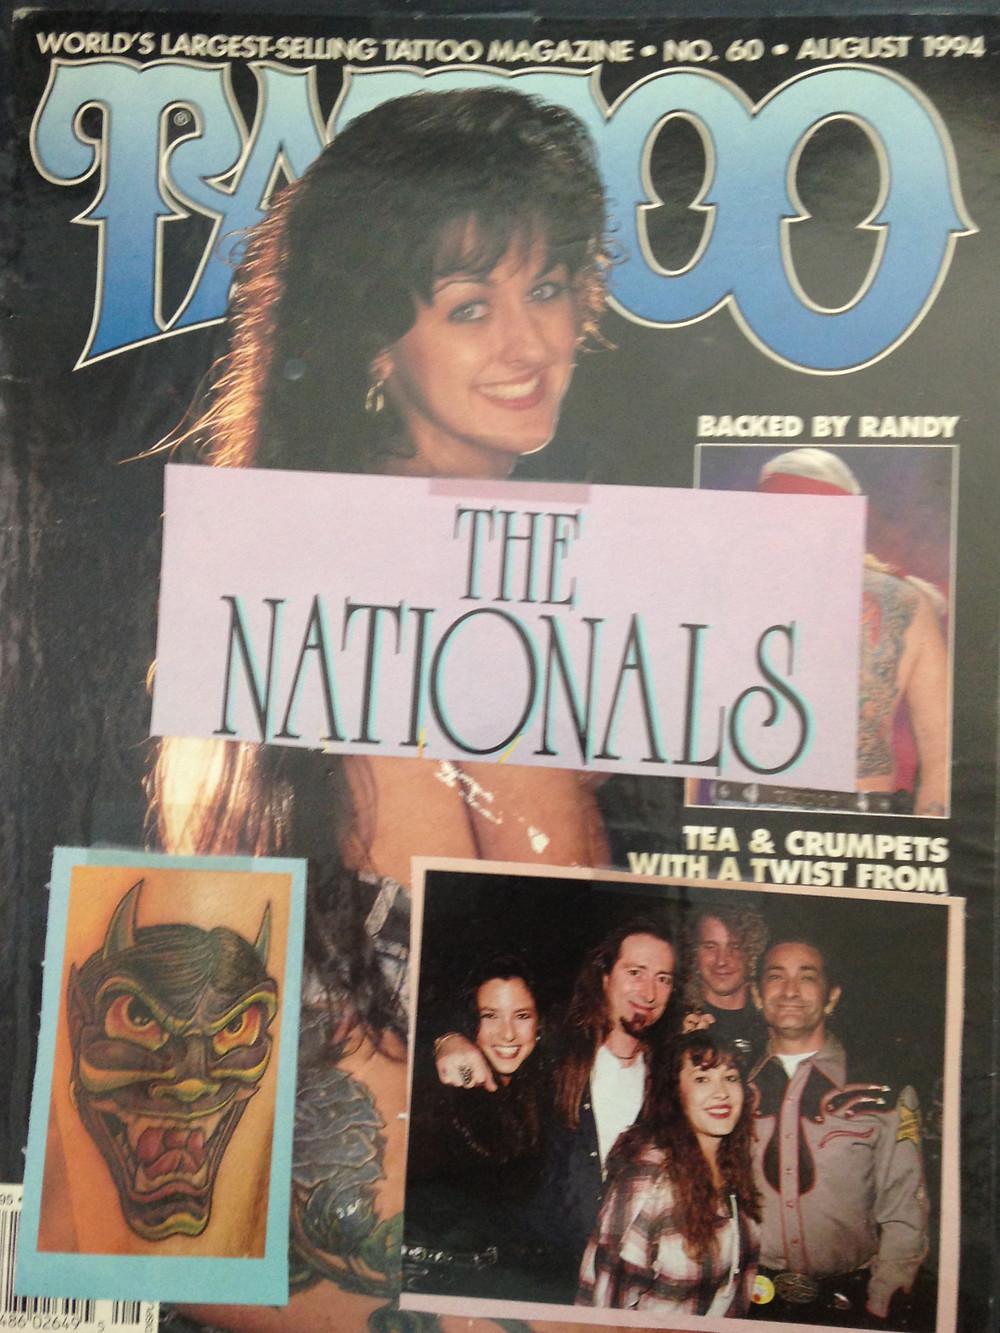 Tattoo Magazine August 1994